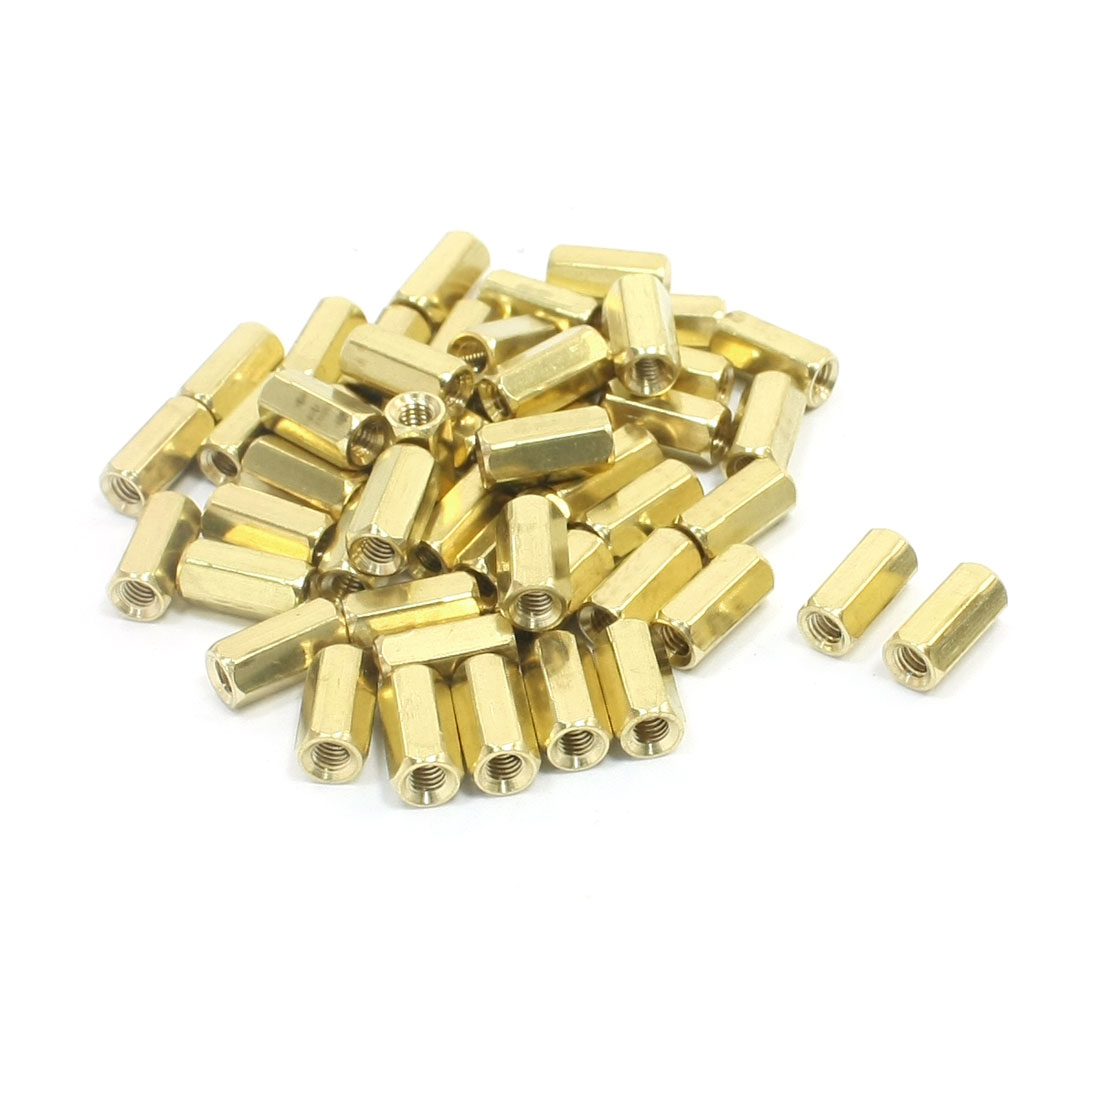 10mm Length M3 Female Thread Dual Ends Gold Tone Brass Pillar Hexagonal Nut PCB Standoff Spacer 50Pcs